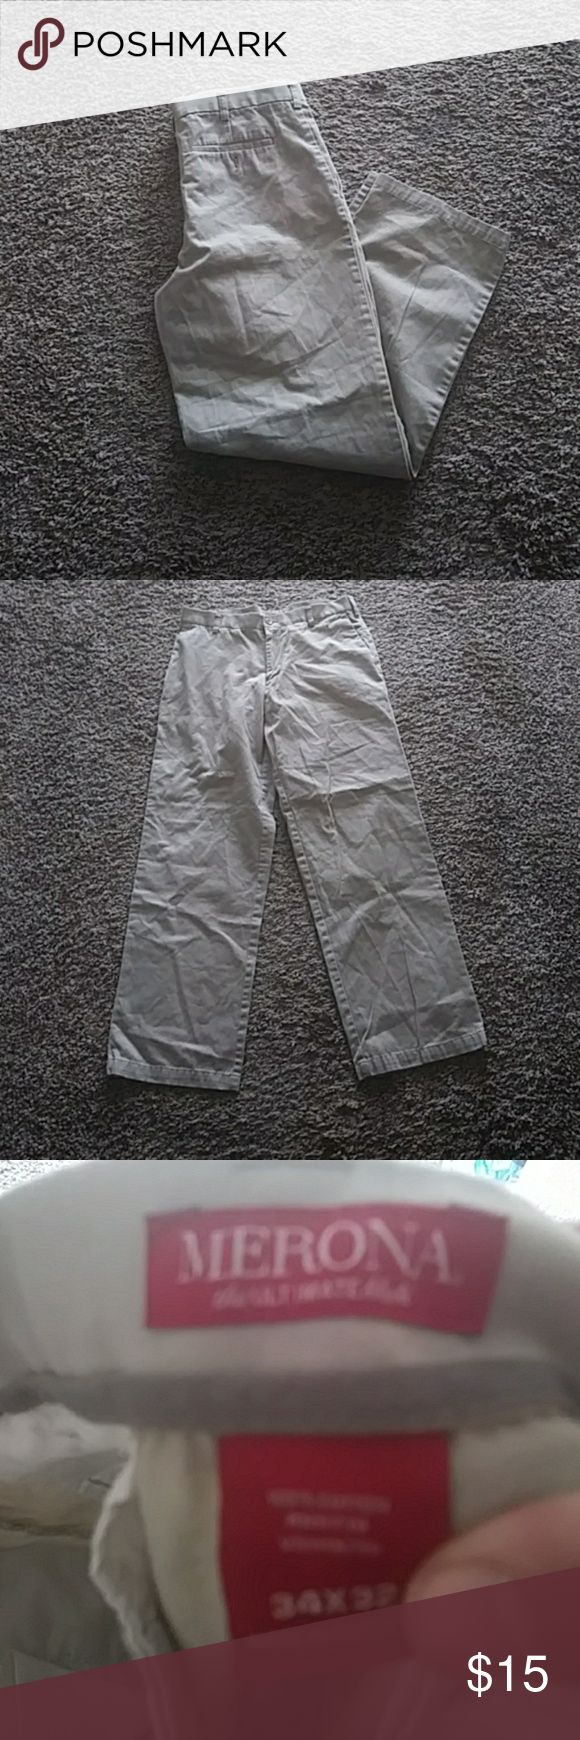 Men's Khaki Pants Good condition. Size 34in x 32in Merona Pants Chinos & Khakis